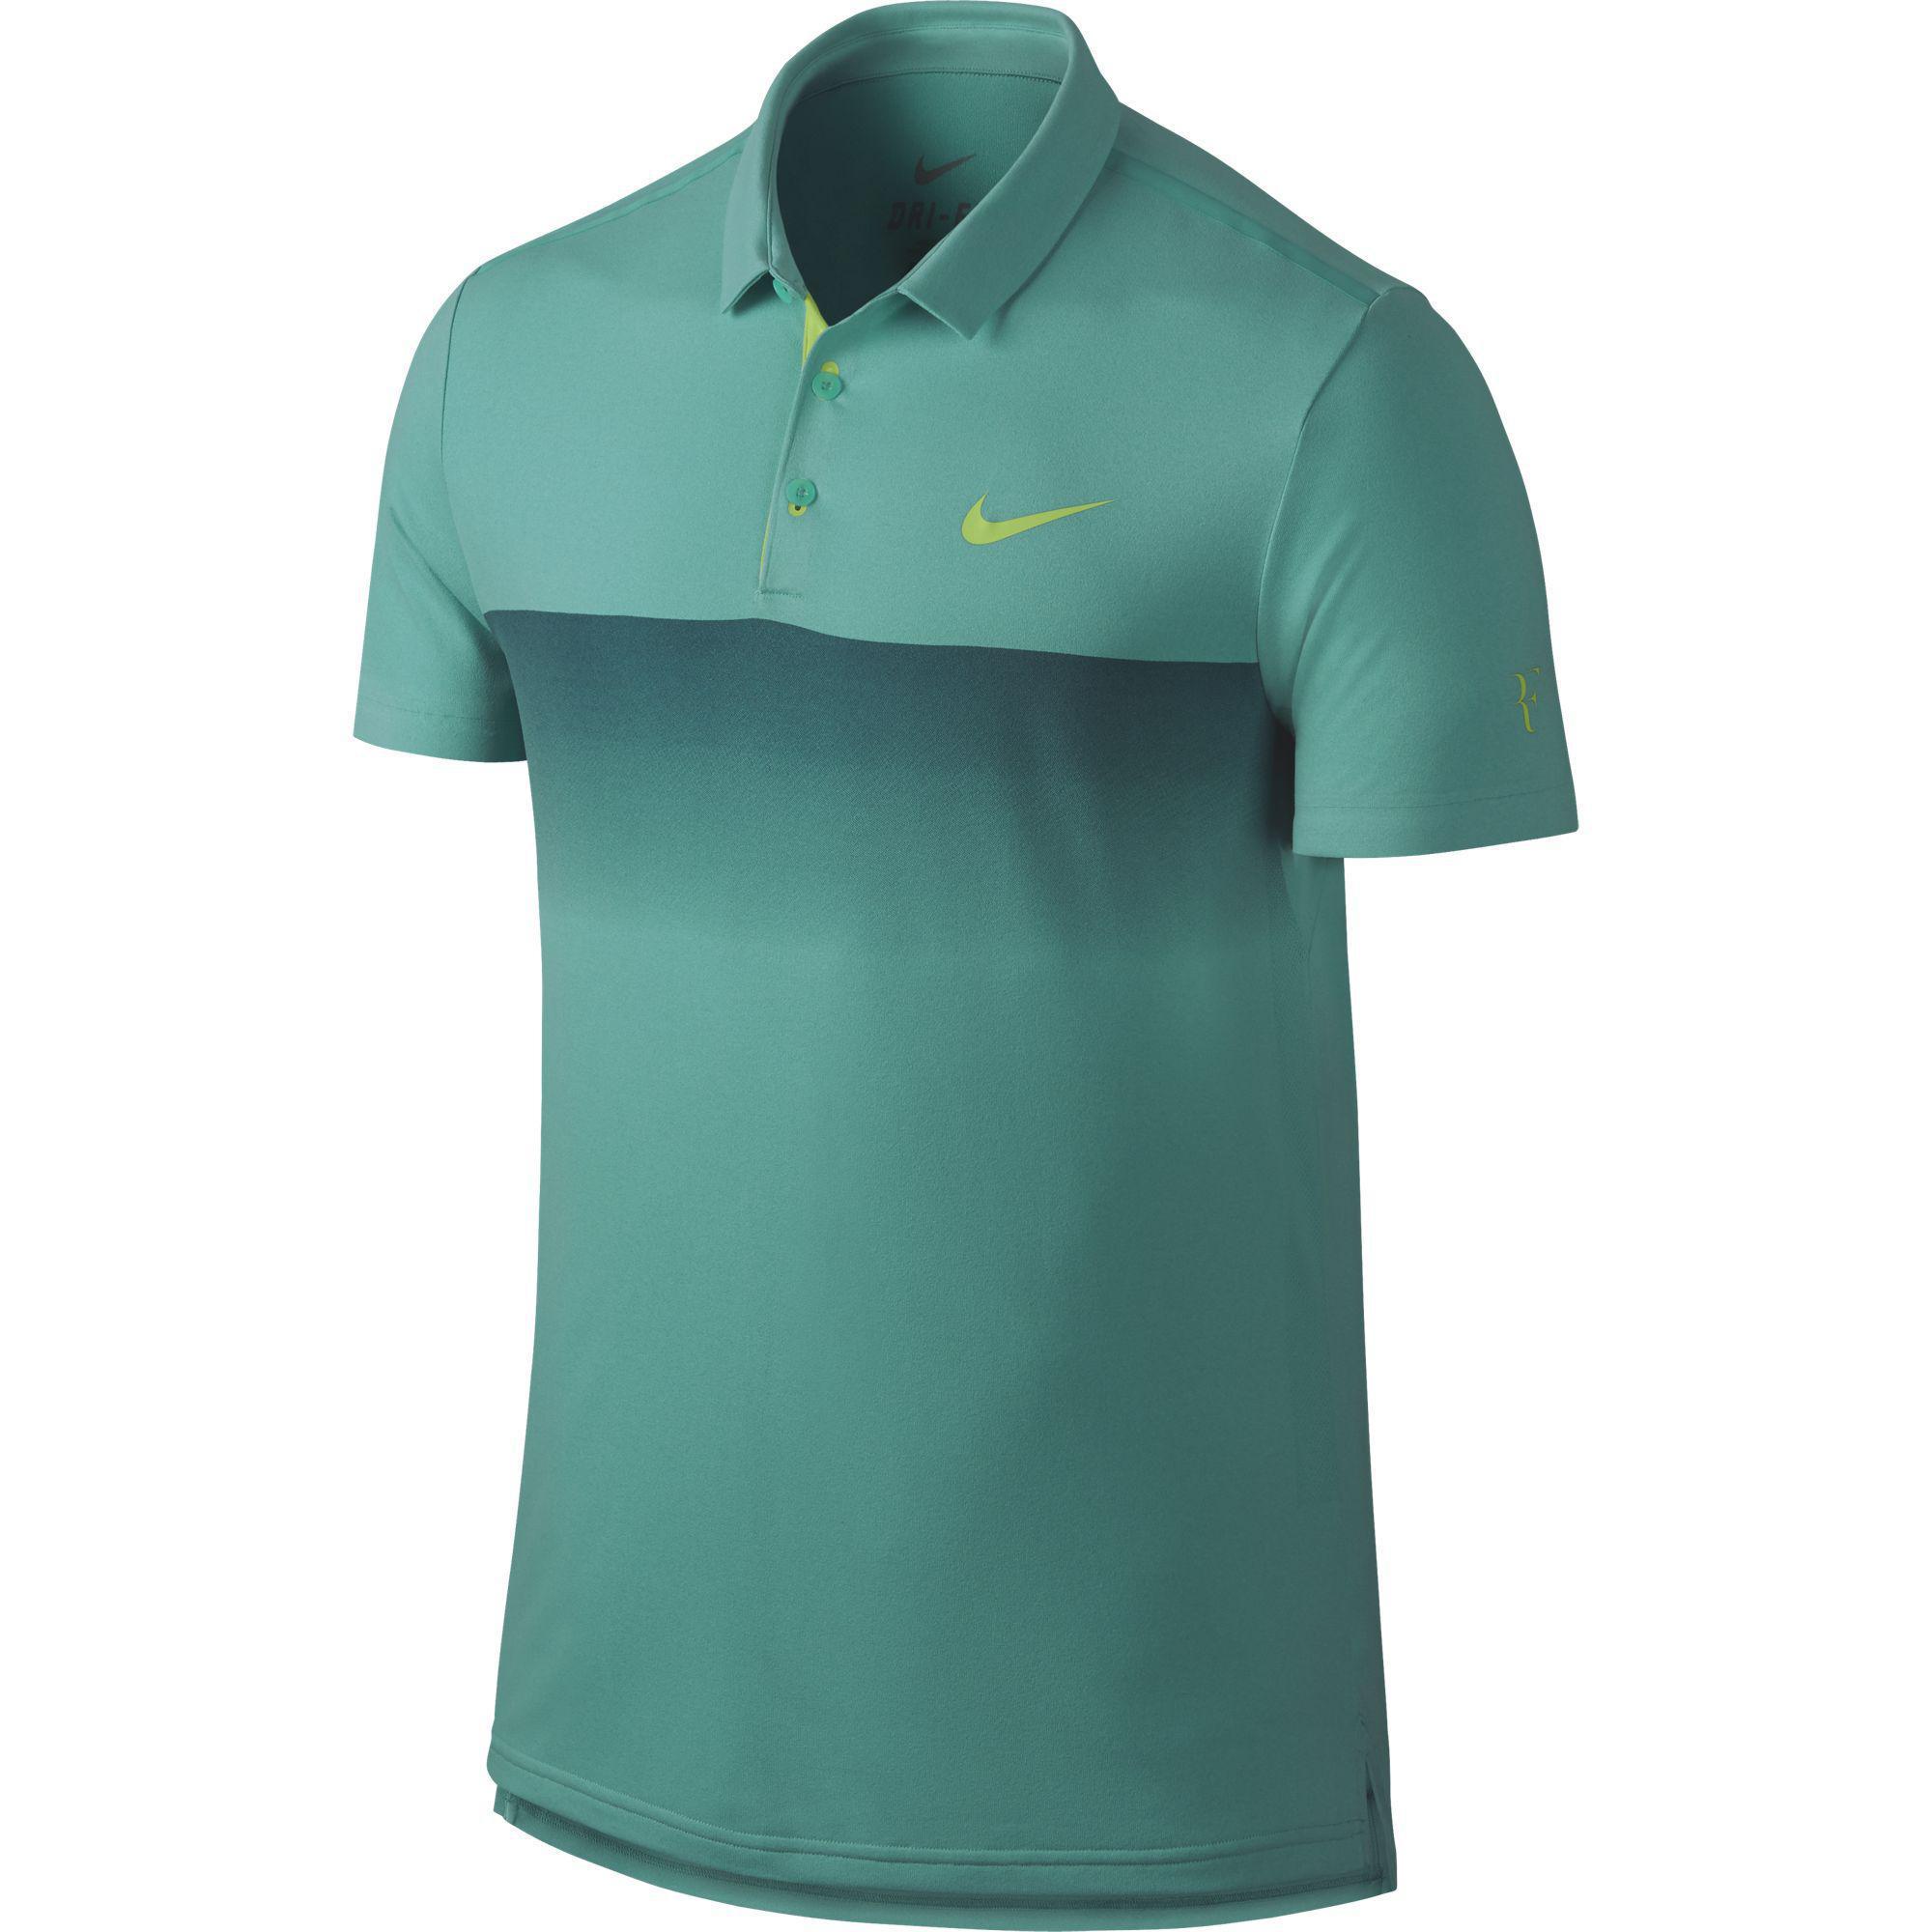 Nike Mens Premier RF Polo - Light Retro Teal Key Lime - Tennisnuts.com 484aaf6e0696